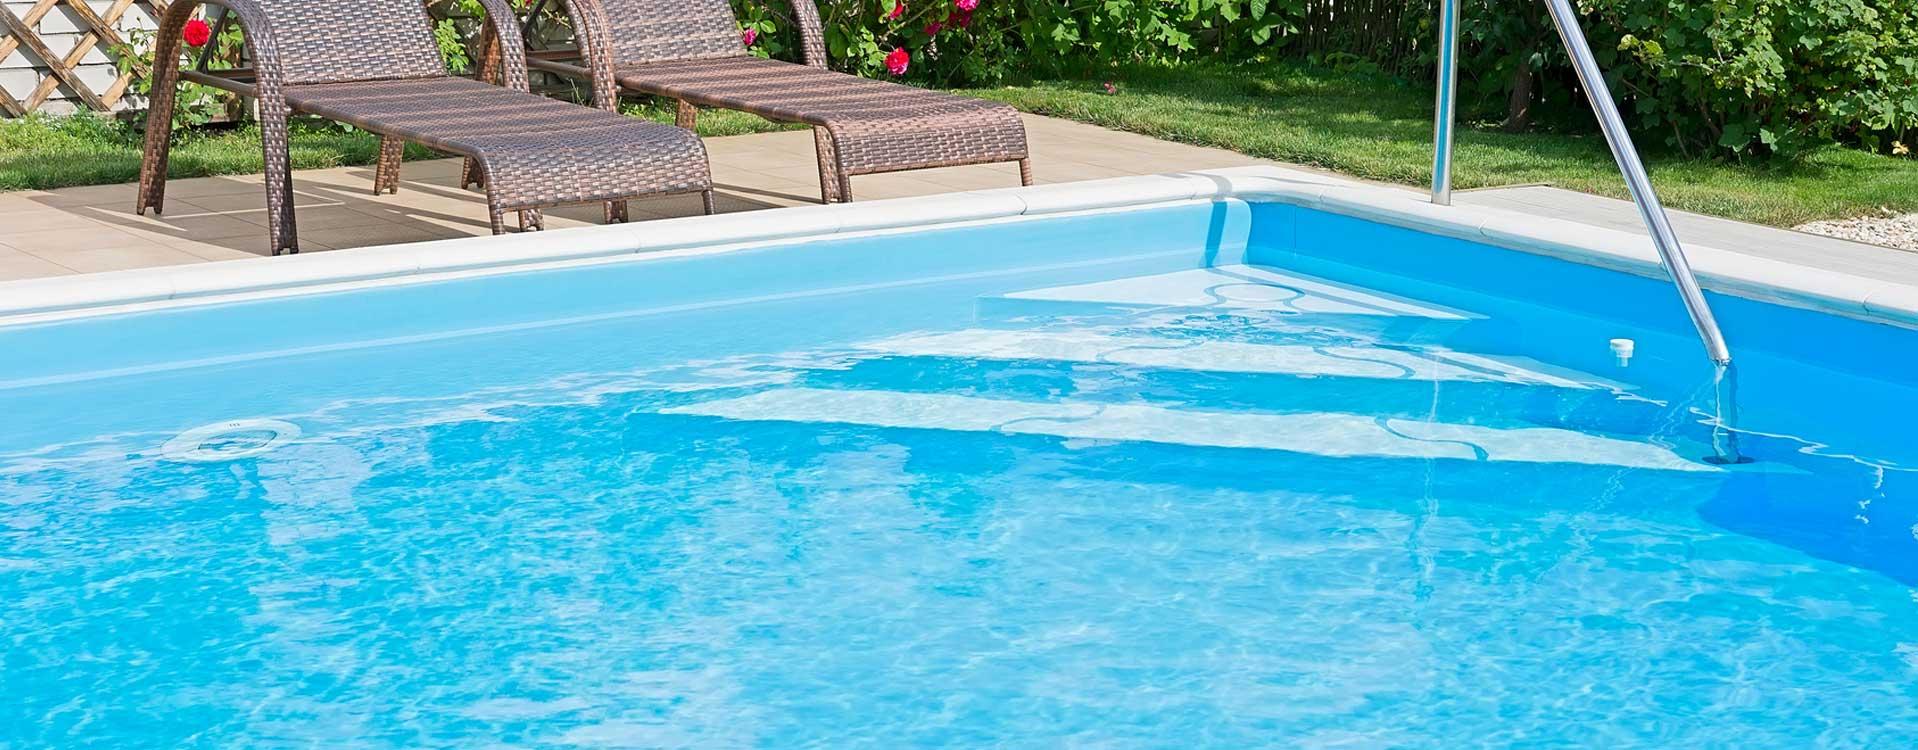 Construction piscine Vaud